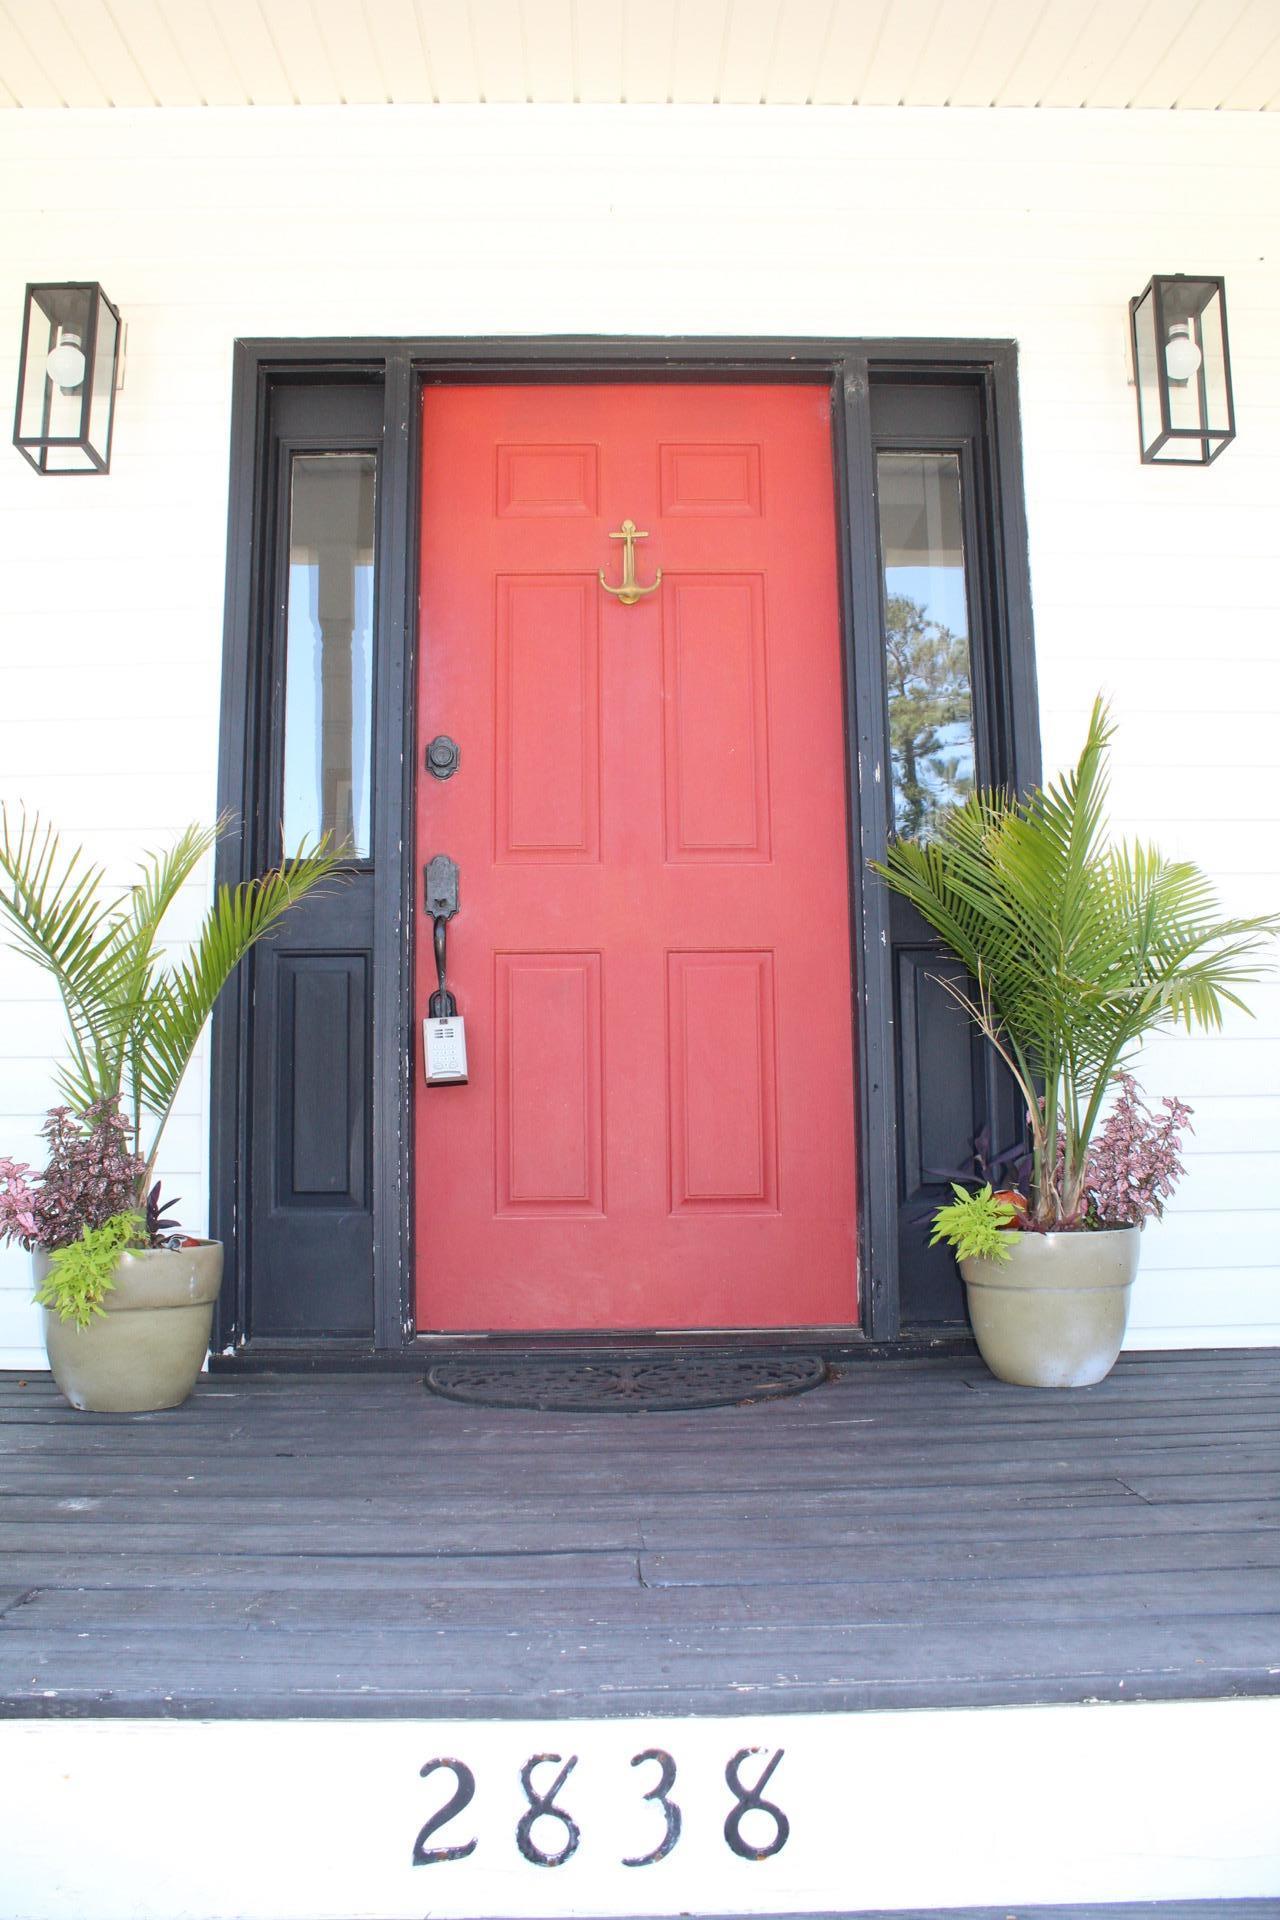 Horlbeck Creek Homes For Sale - 2838 Tradewind, Mount Pleasant, SC - 8